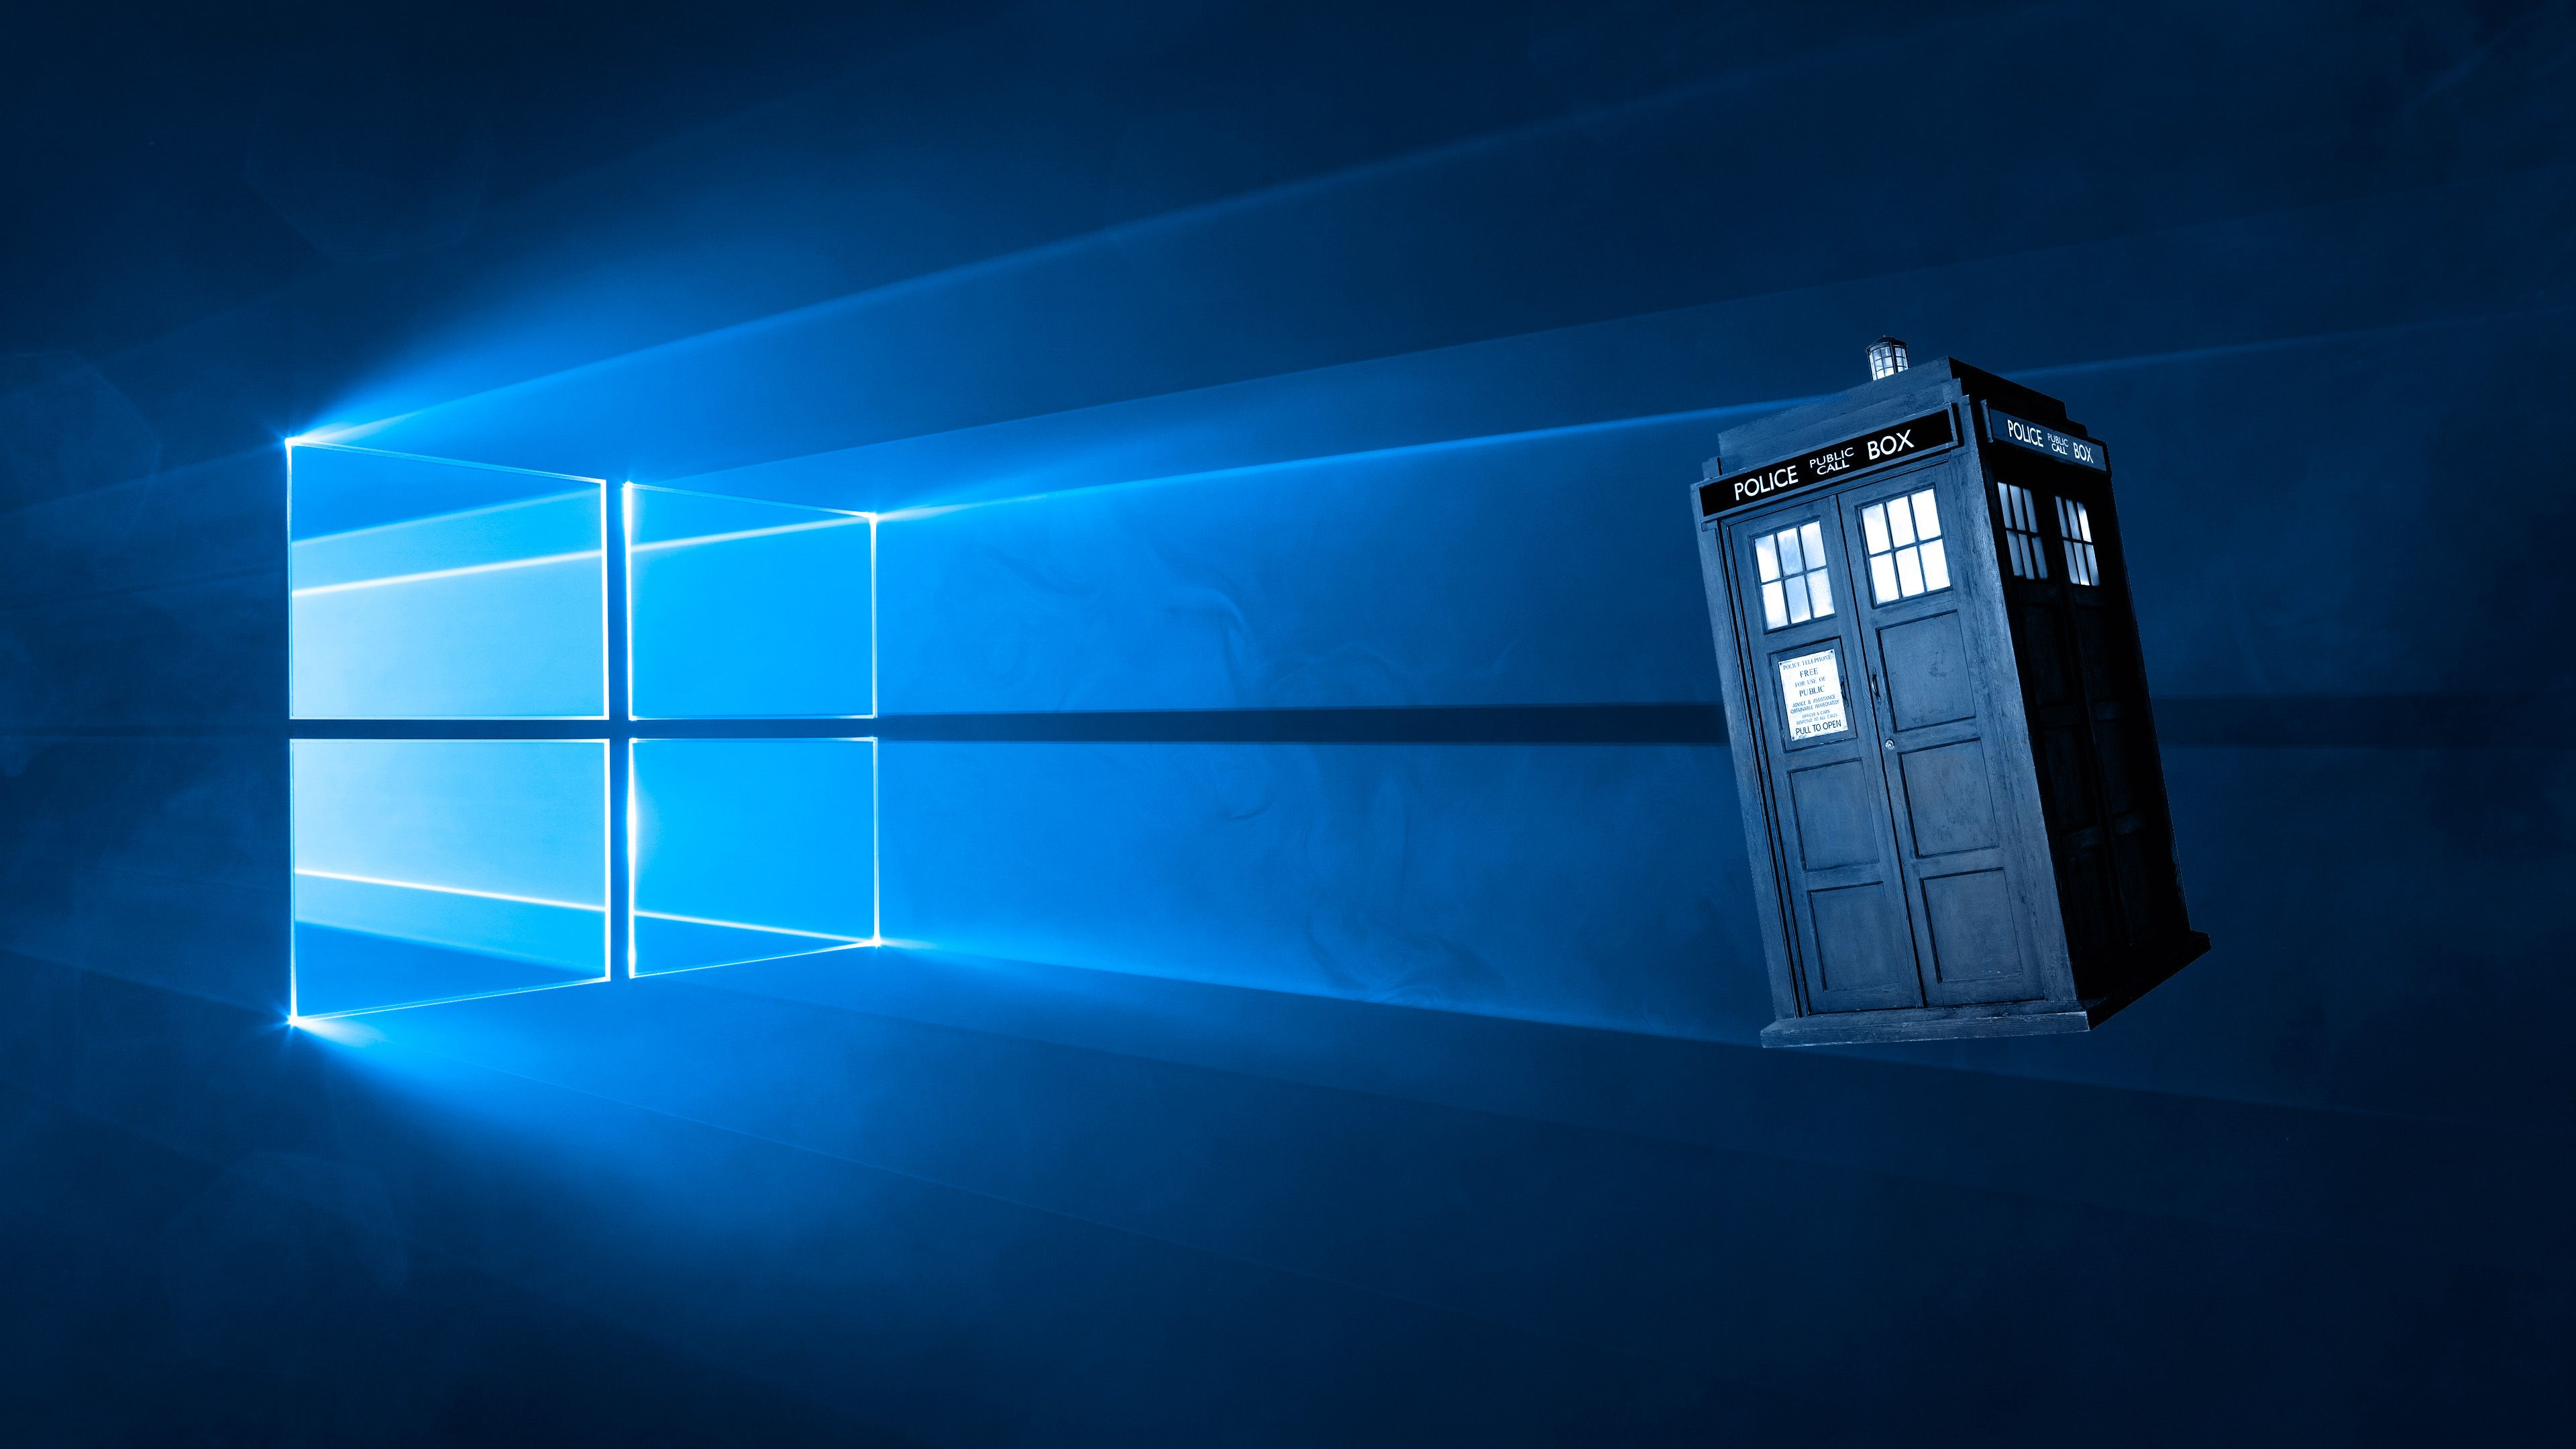 Doctor Who Wallpaper iPhone Handy hintergrundbild, Die